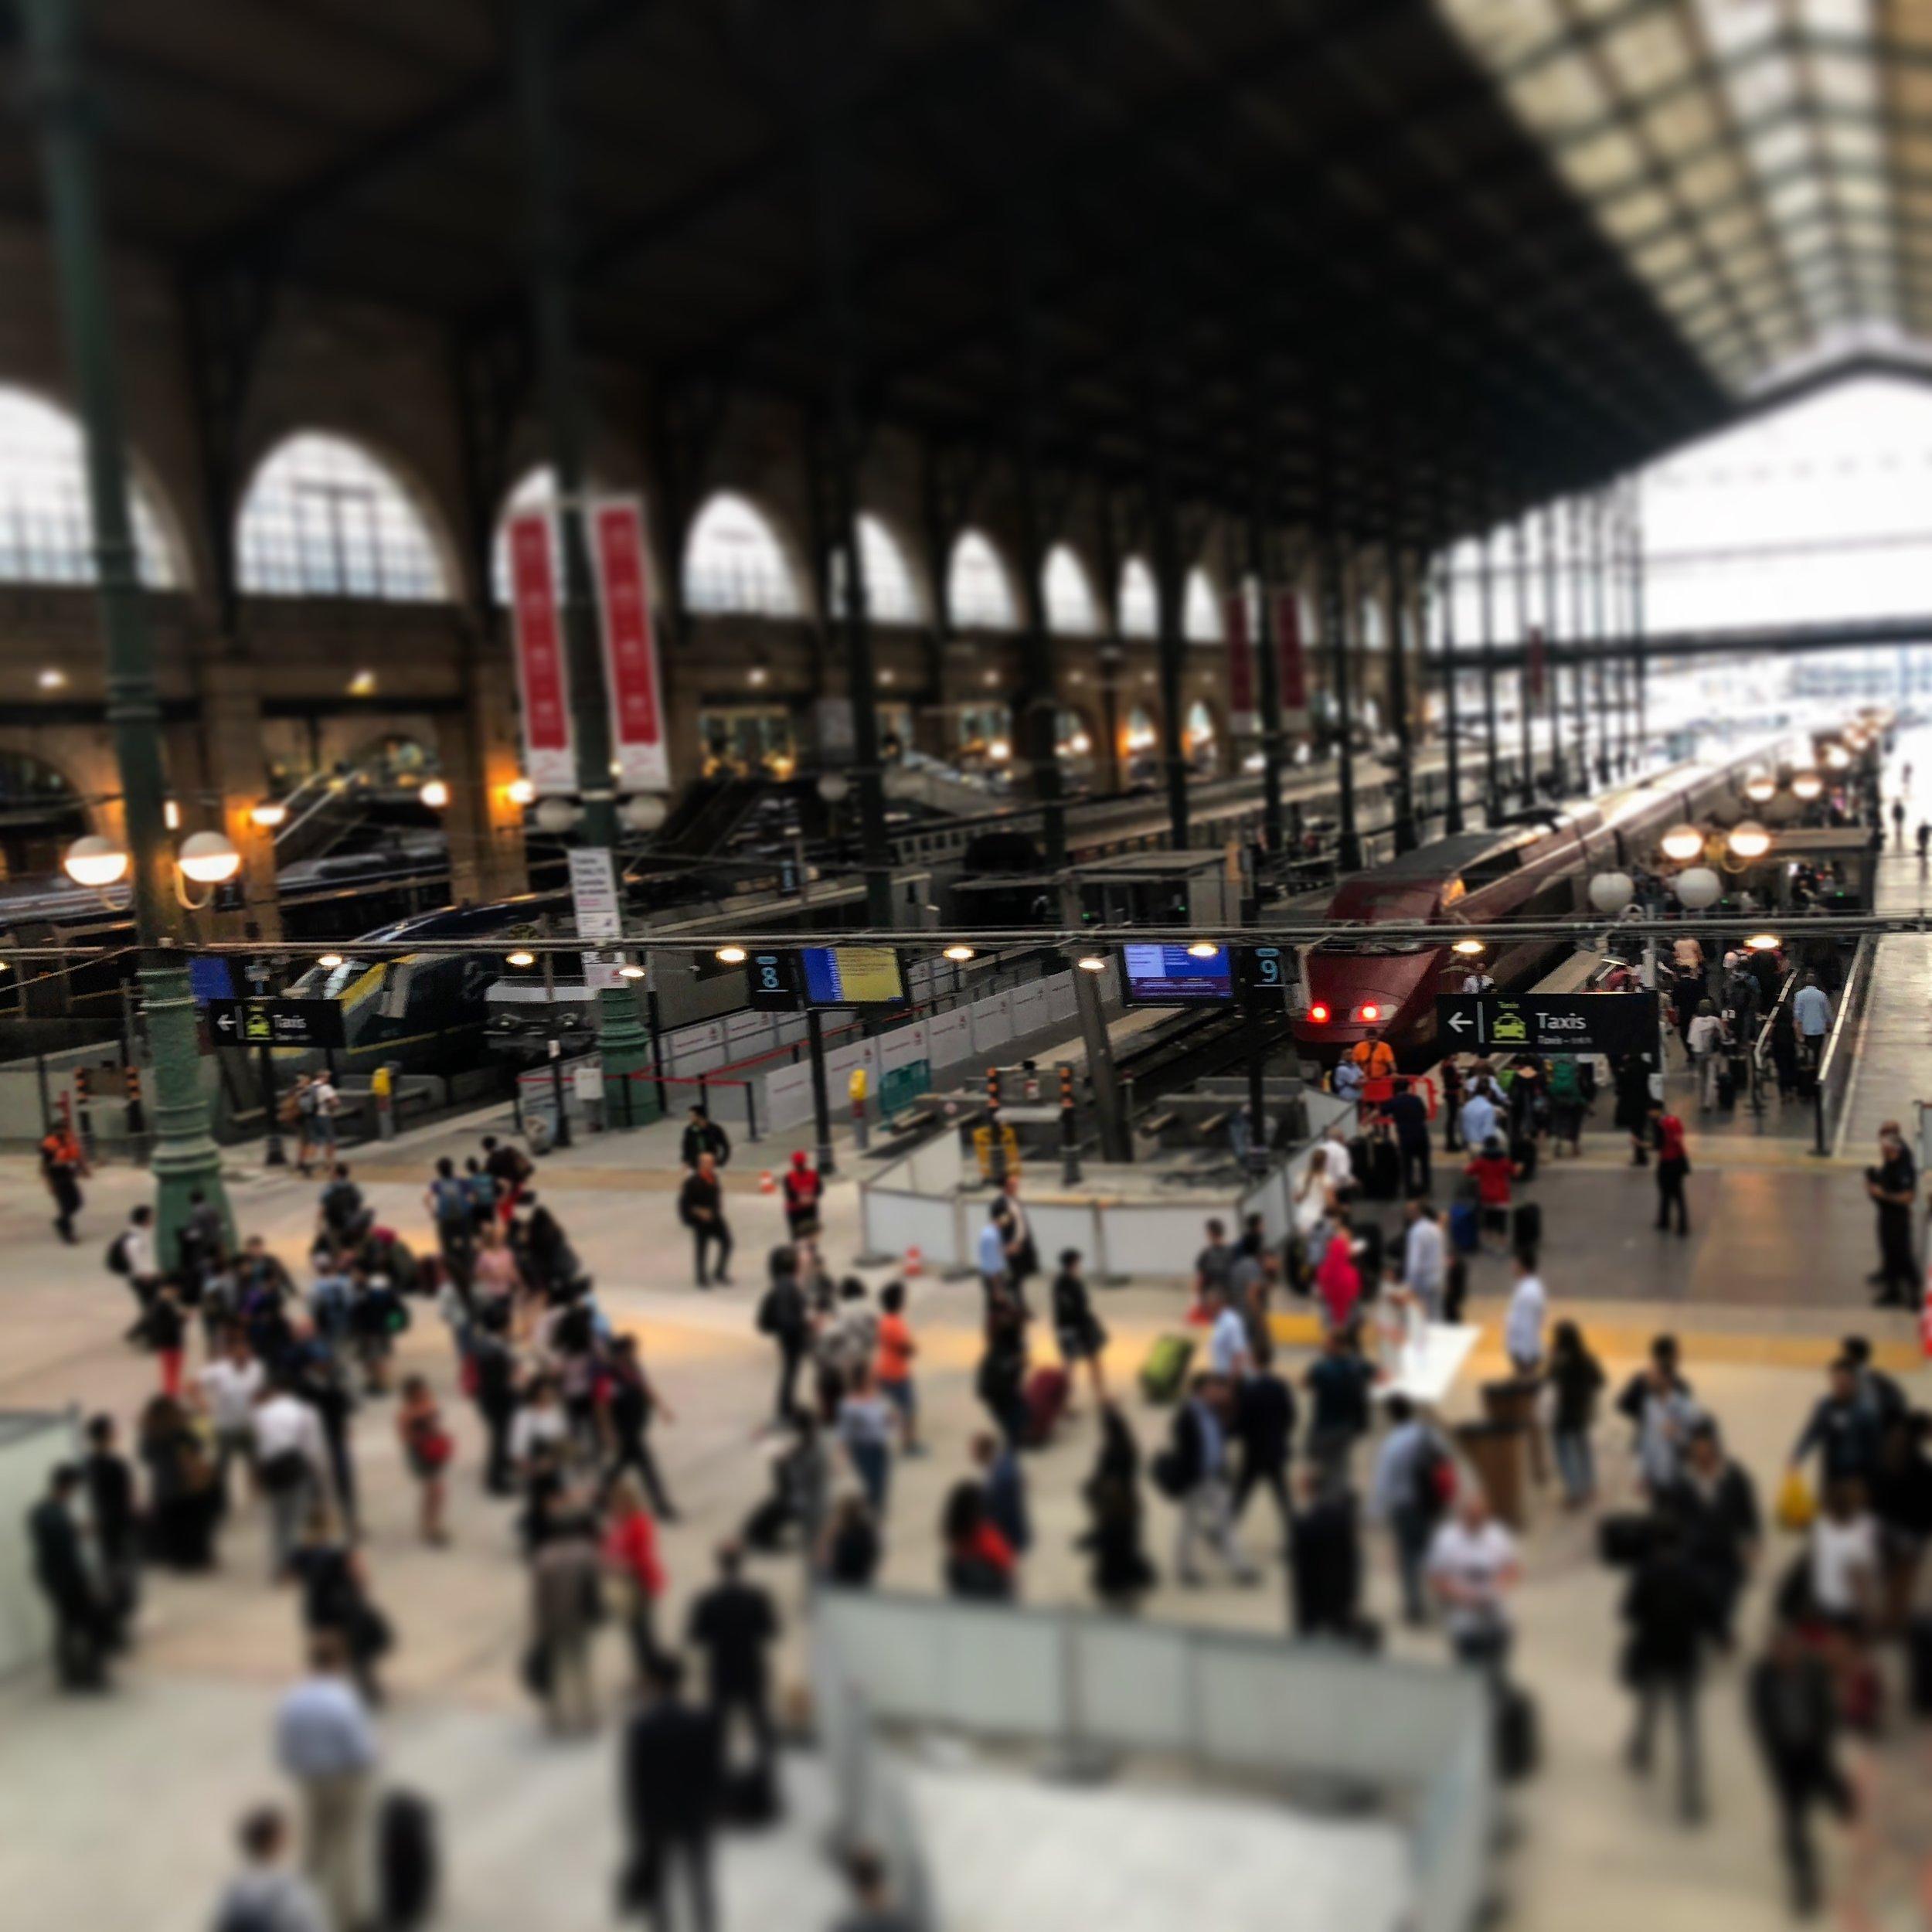 Commuters in London Photo by JC Johnson